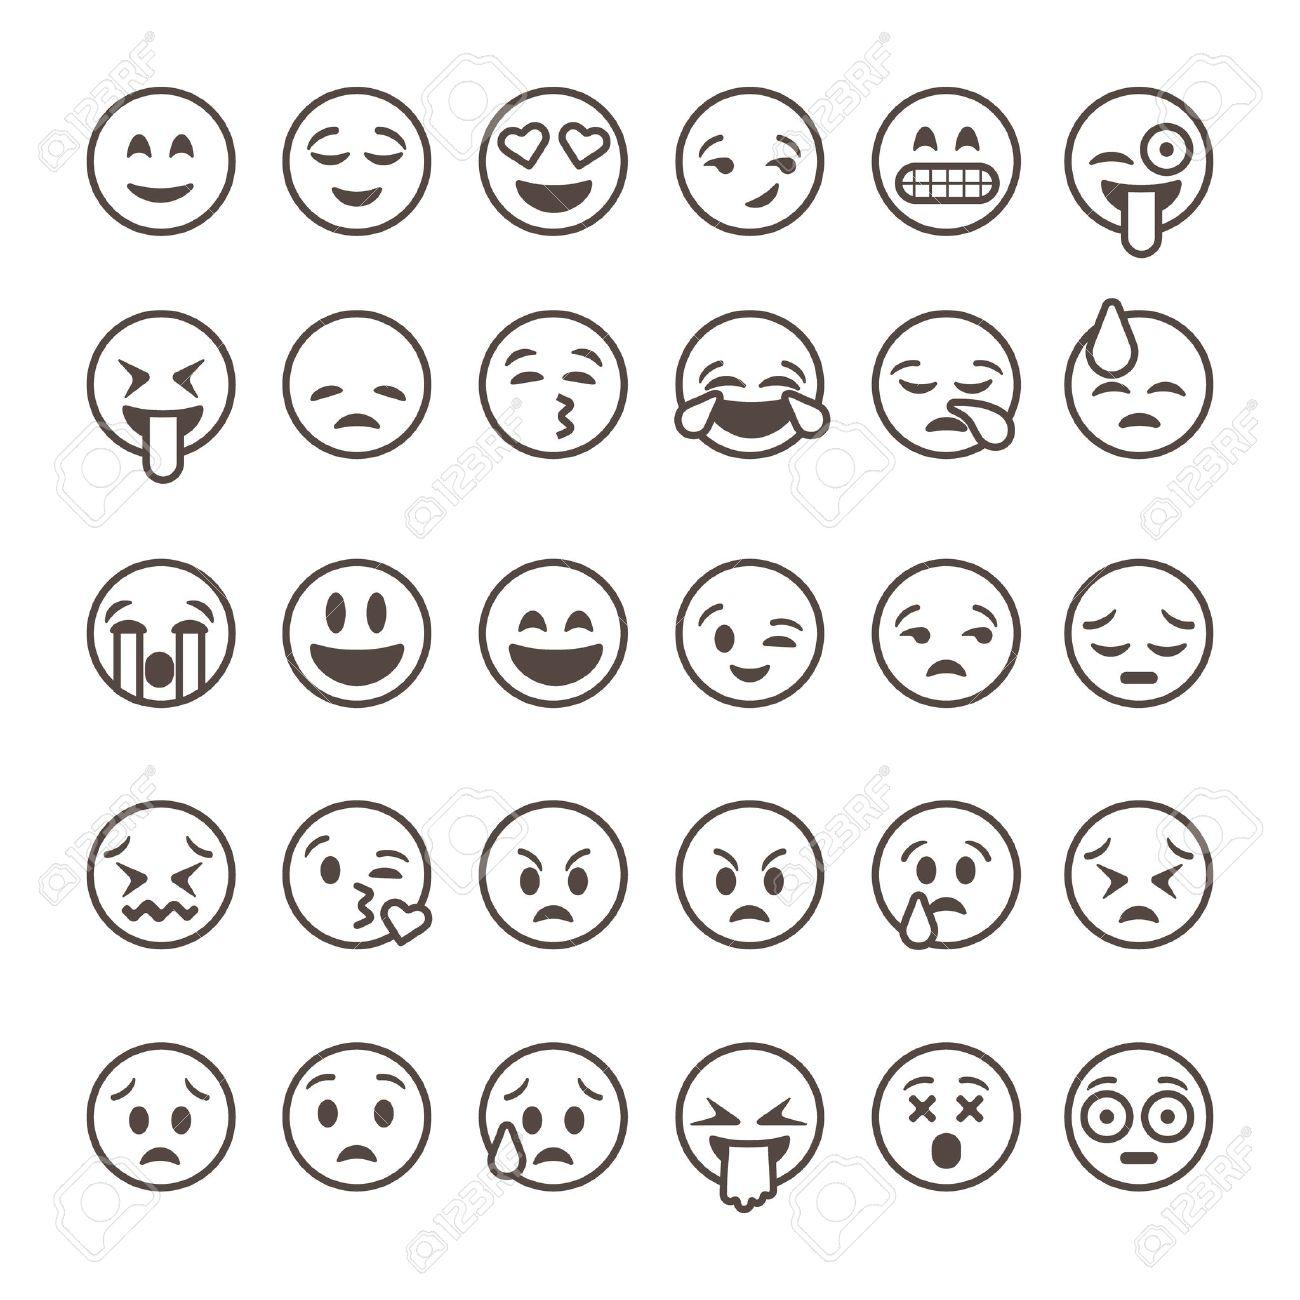 Set of outline emoticons, emoji isolated on white background, vector illustration. Standard-Bild - 53022847